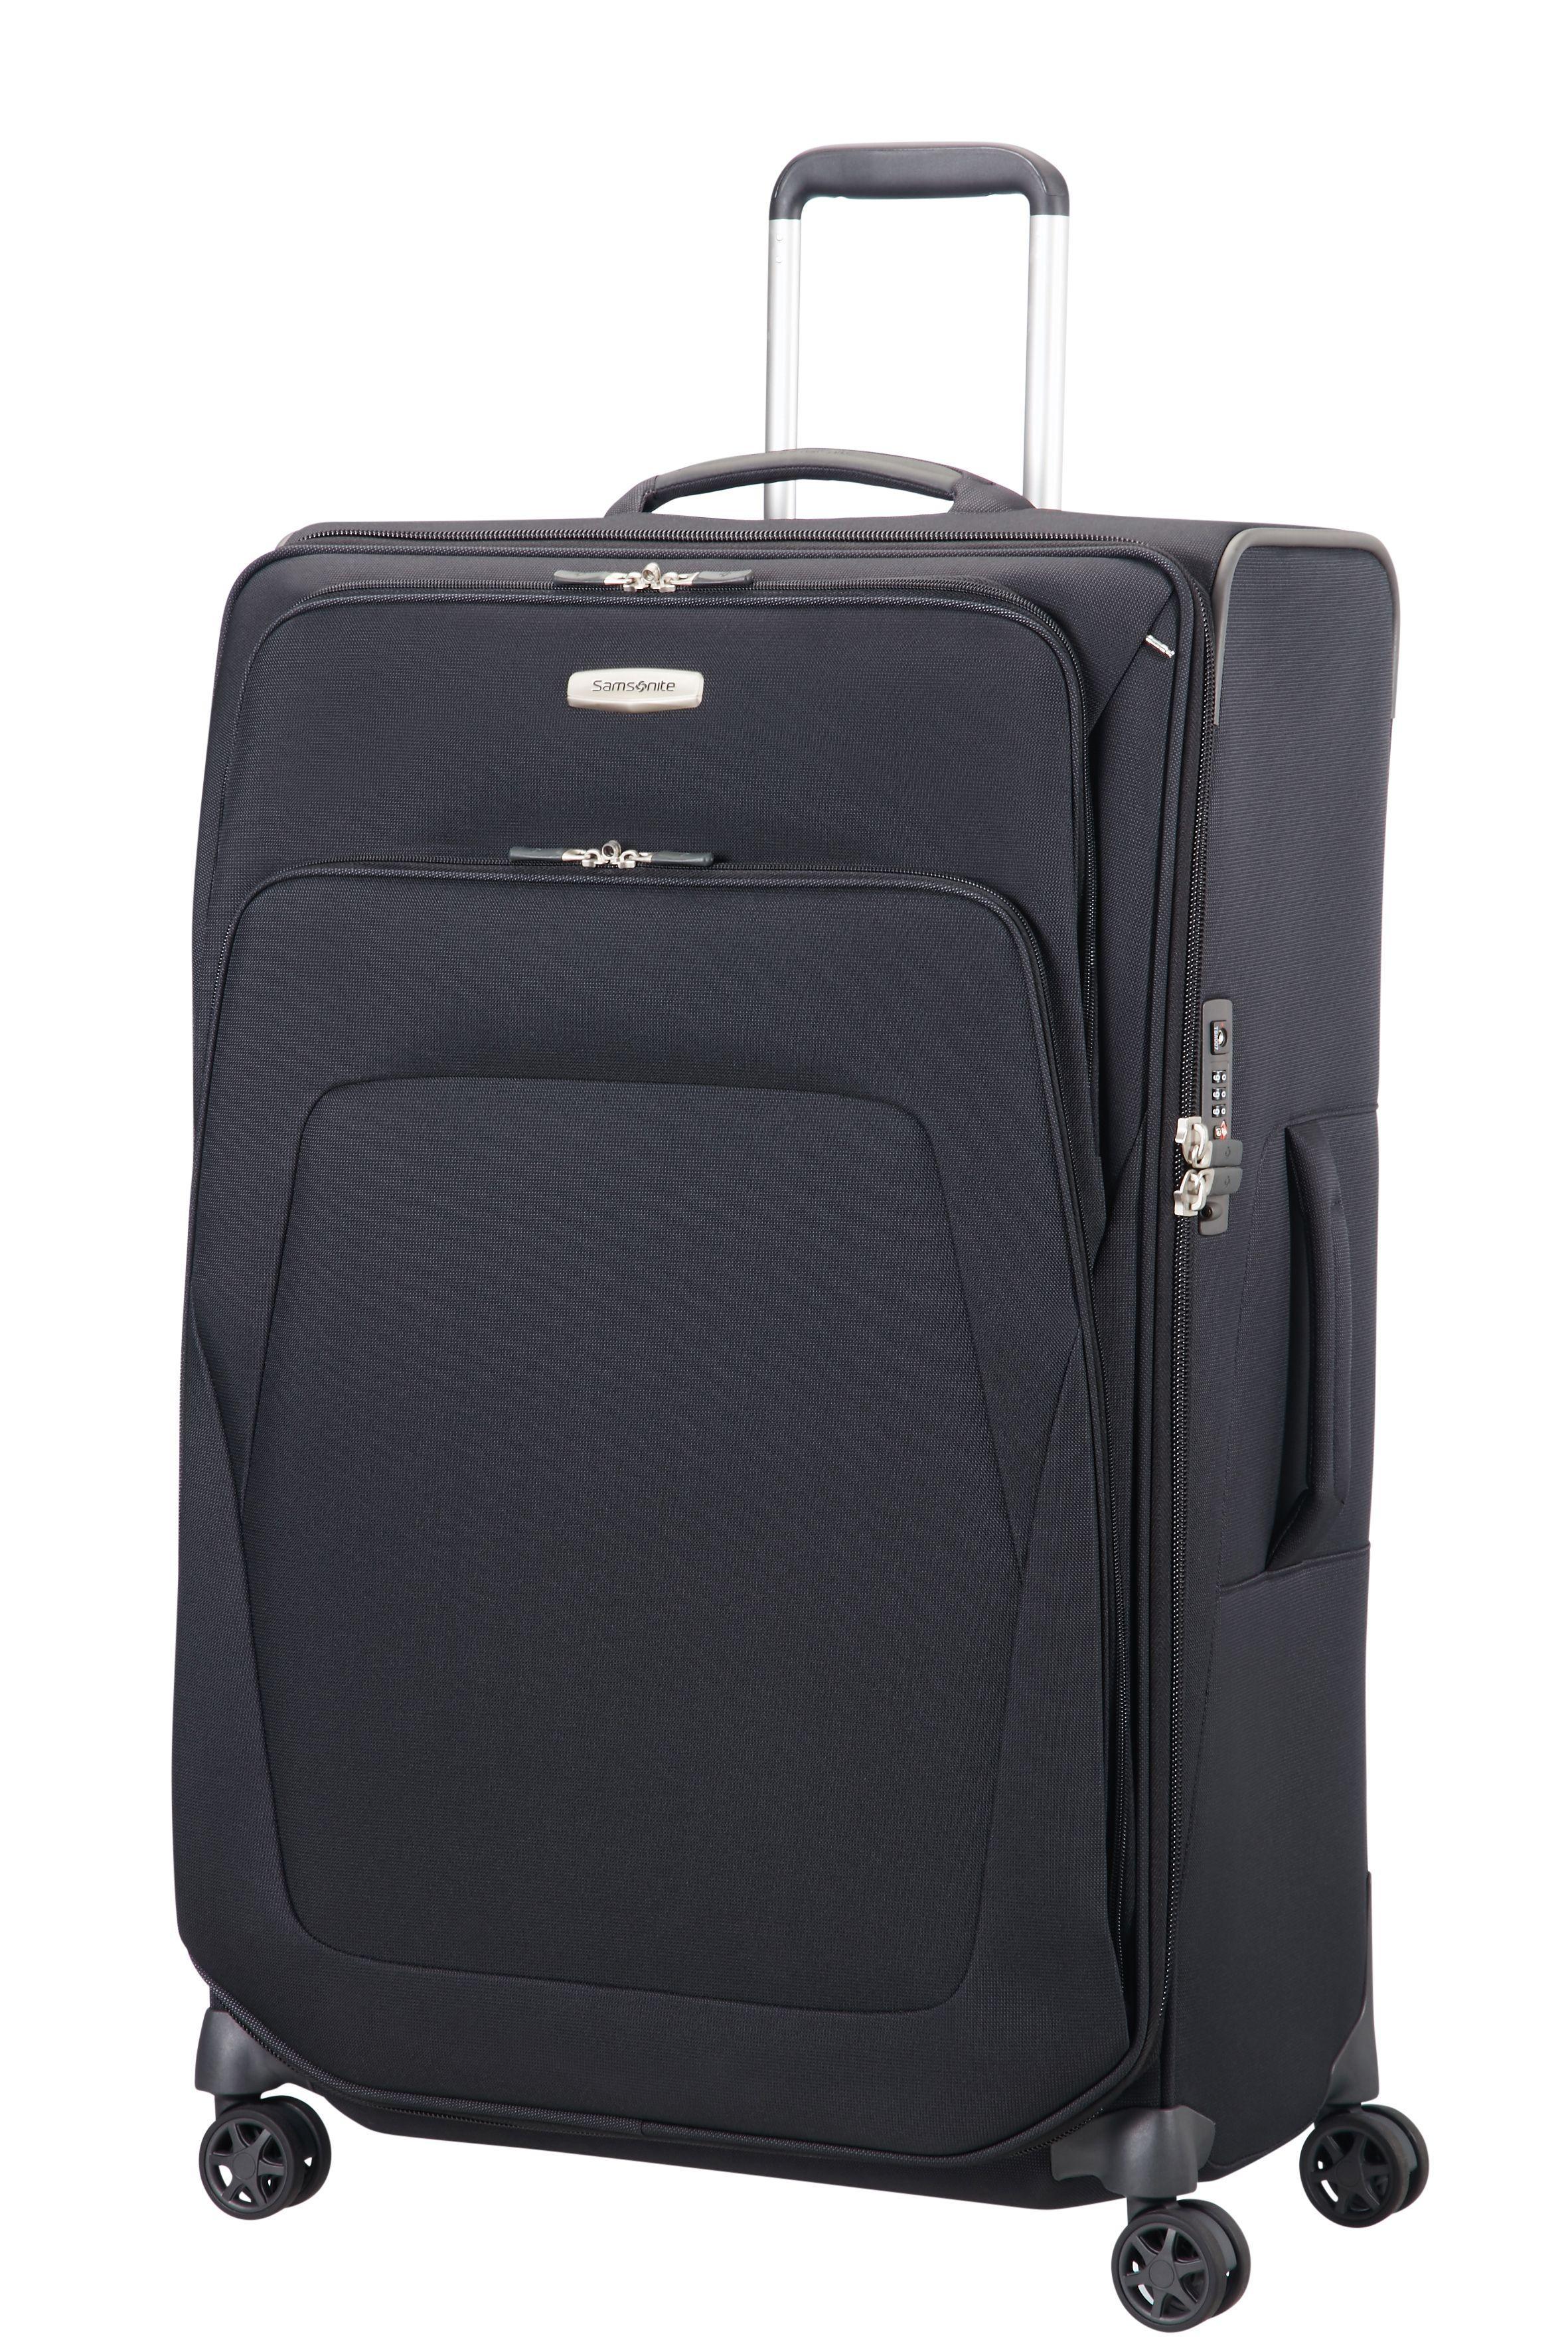 Samsonite Spark Sng Black 4 Wheel 79cm Large Suitcase In Black For Men